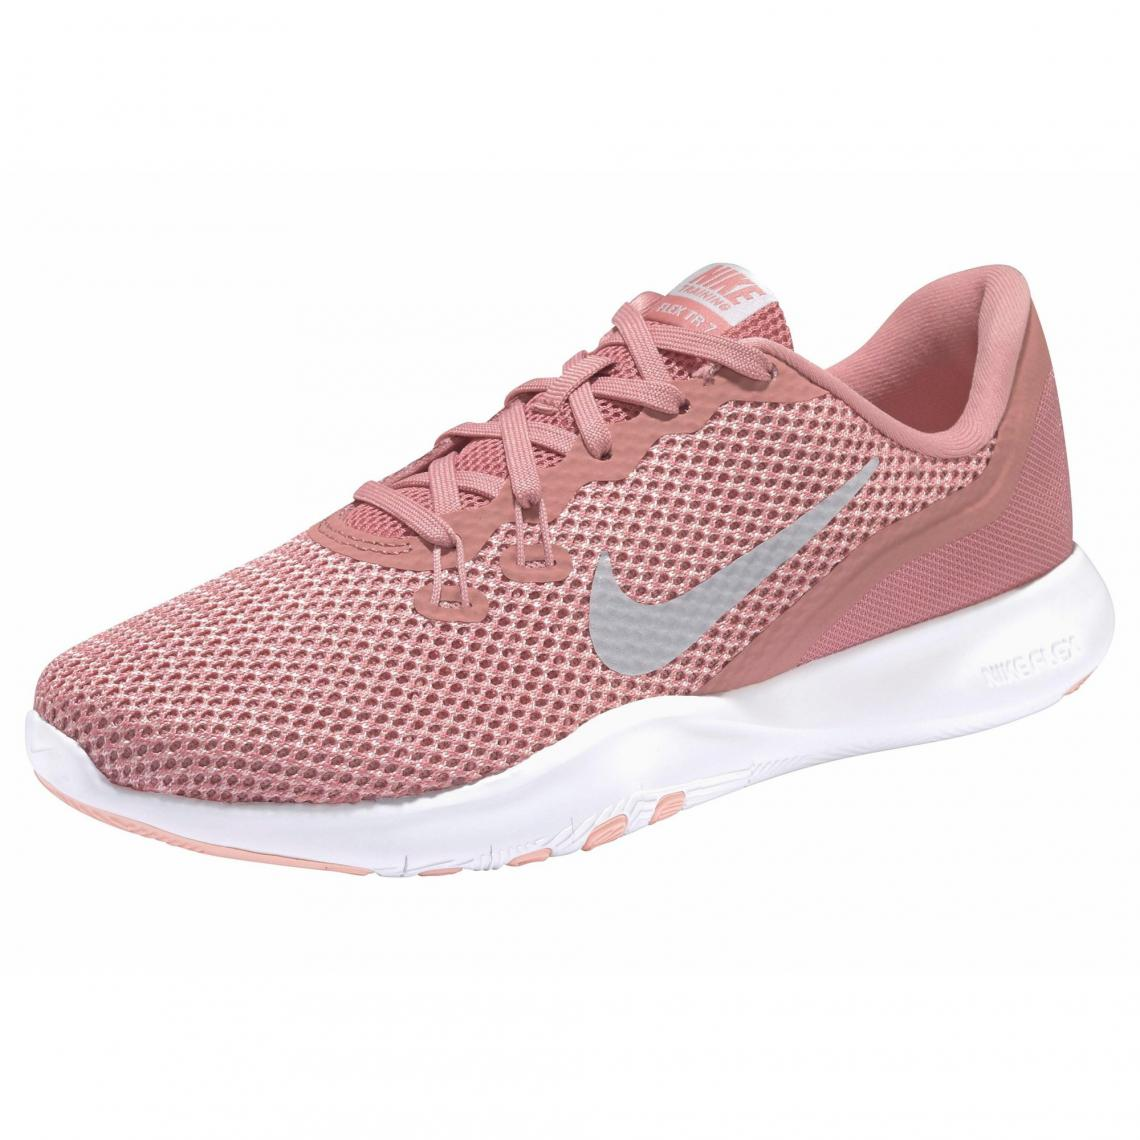 Nike Pour De Sombre Running Flex Trainer 7 Femme Rose Chaussures vnwOymN08